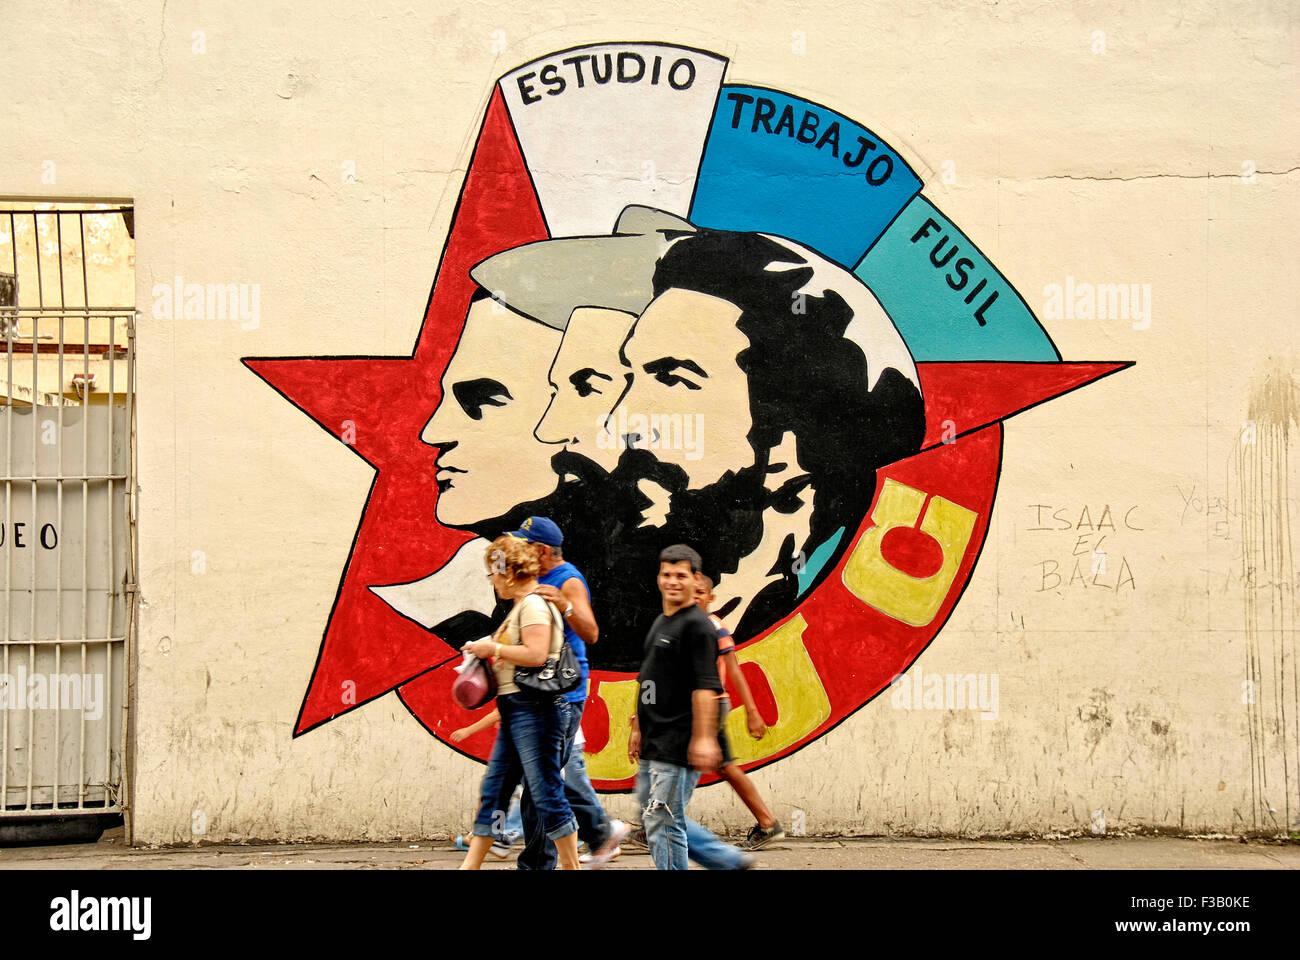 Cuban Revolution Painting Stock Photos & Cuban Revolution Painting ...